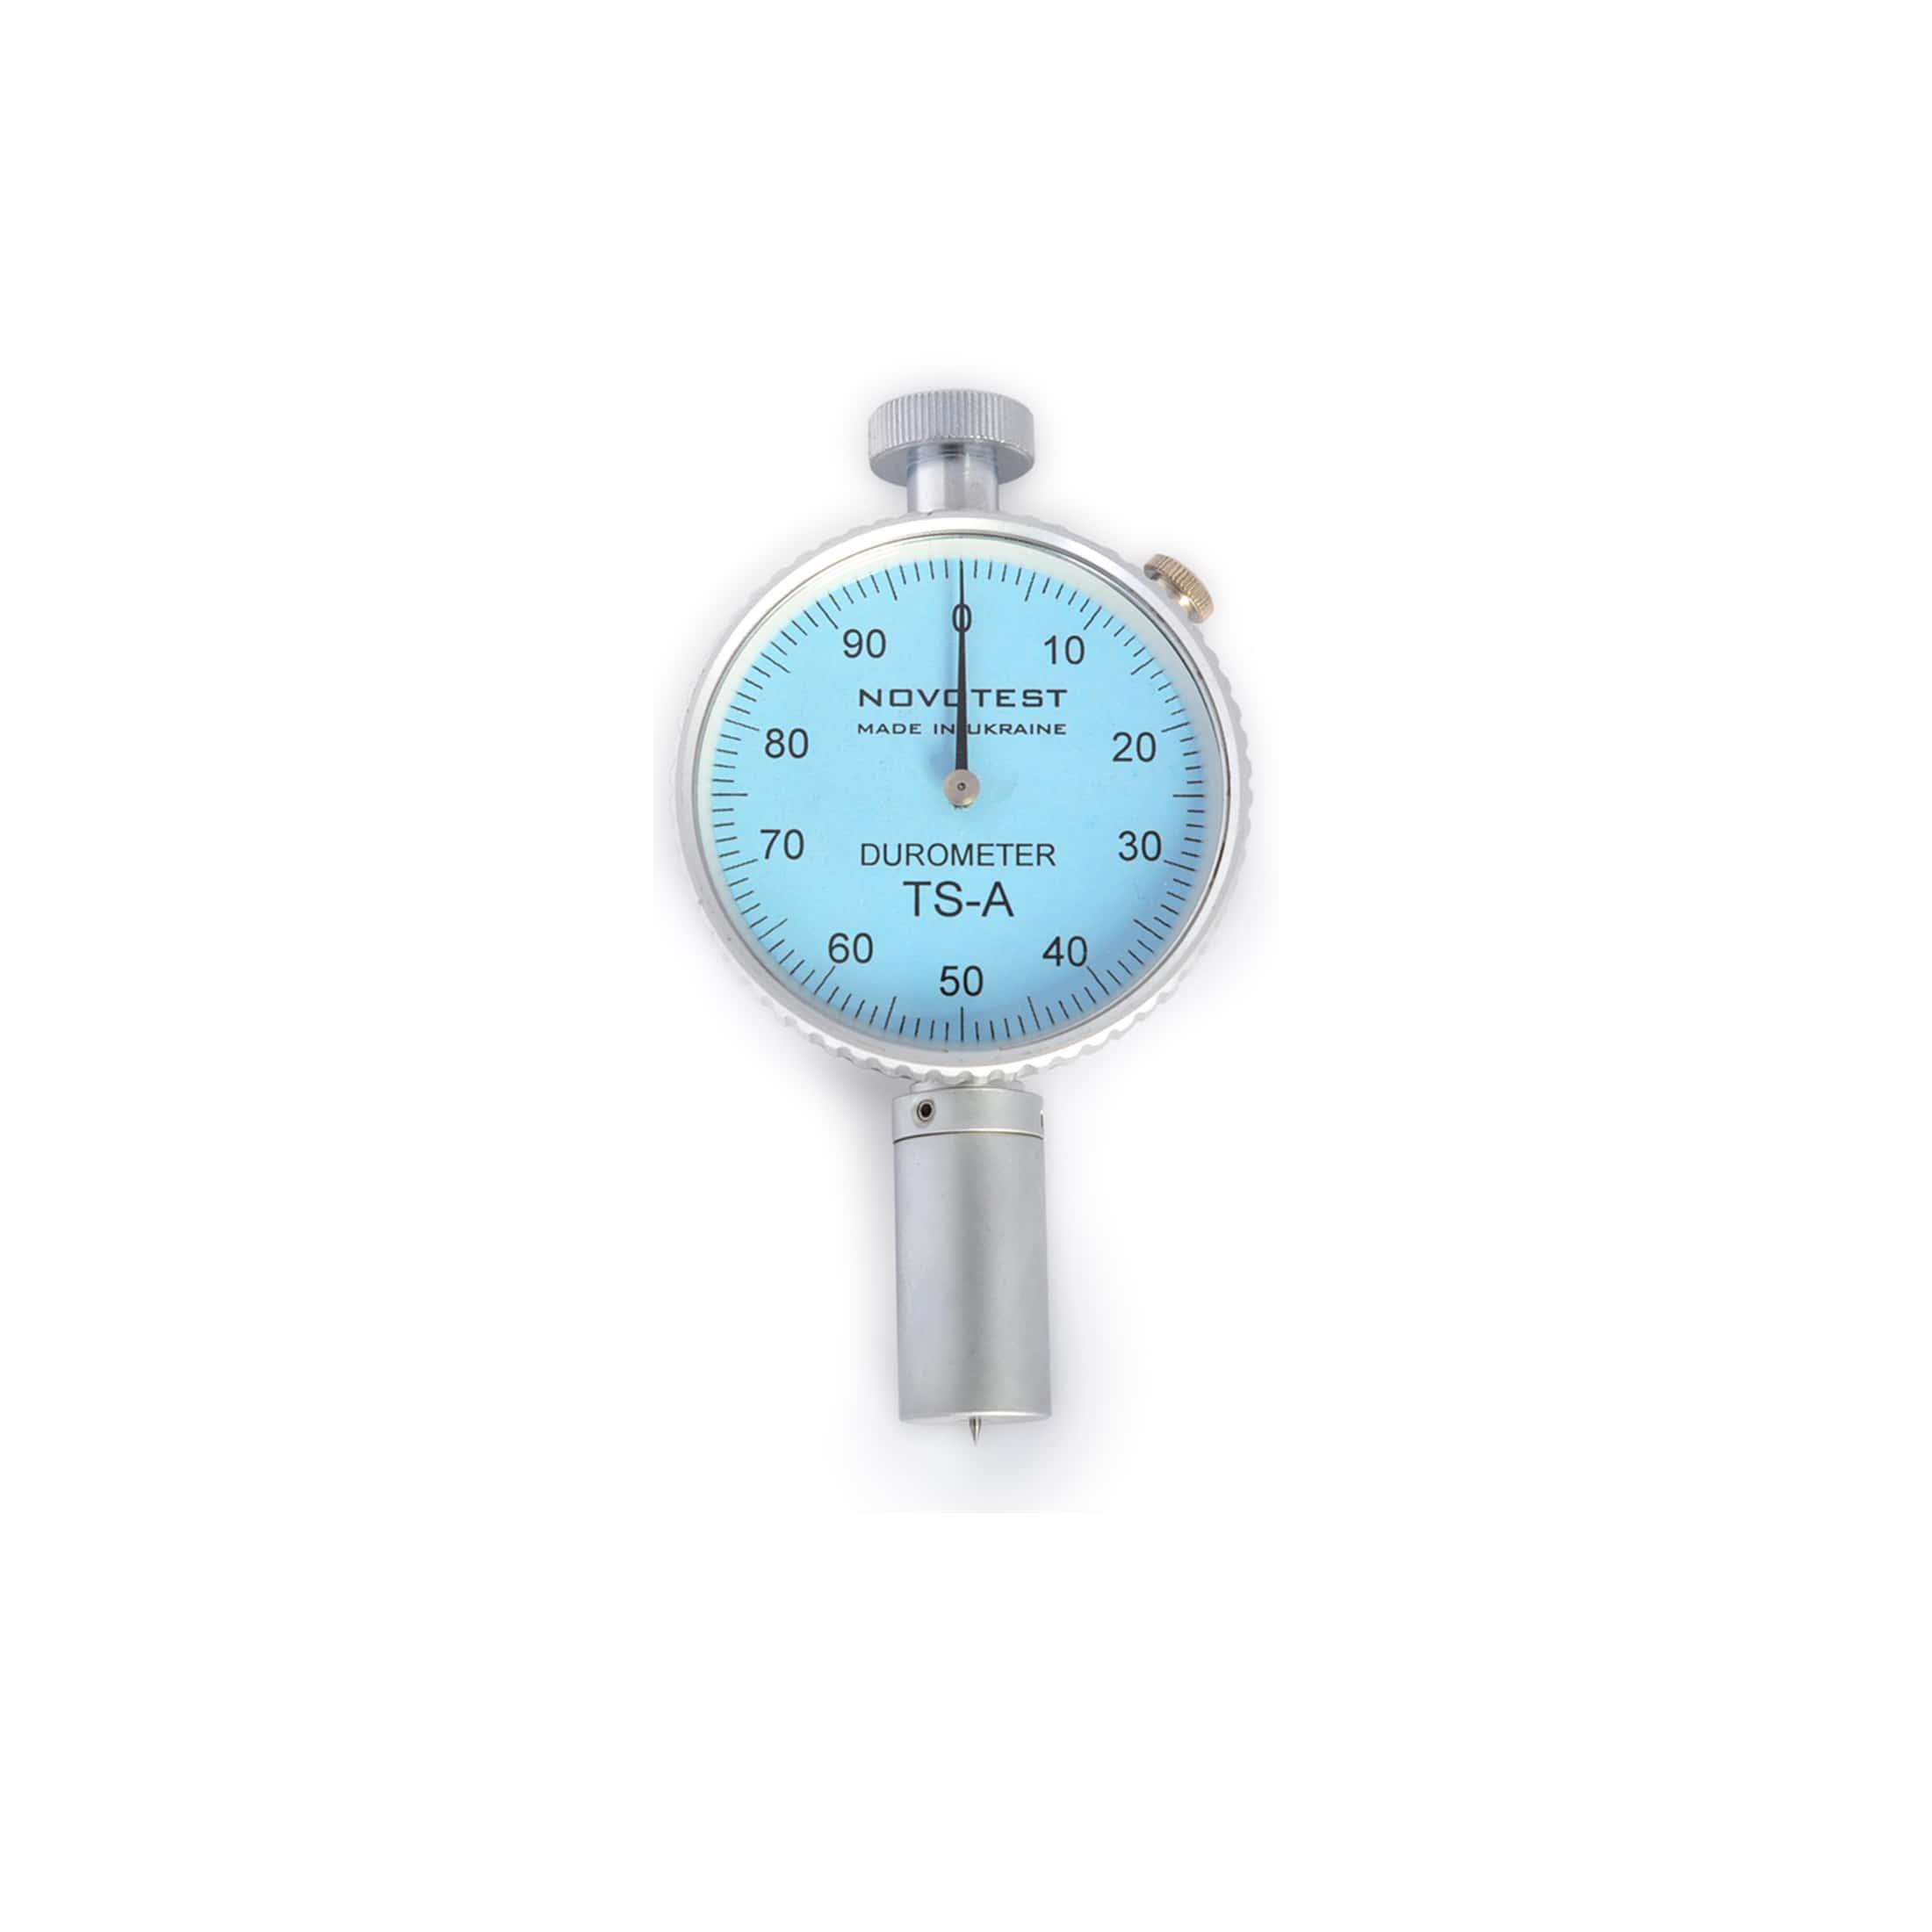 Shore Durometer NOVOTEST TS-A